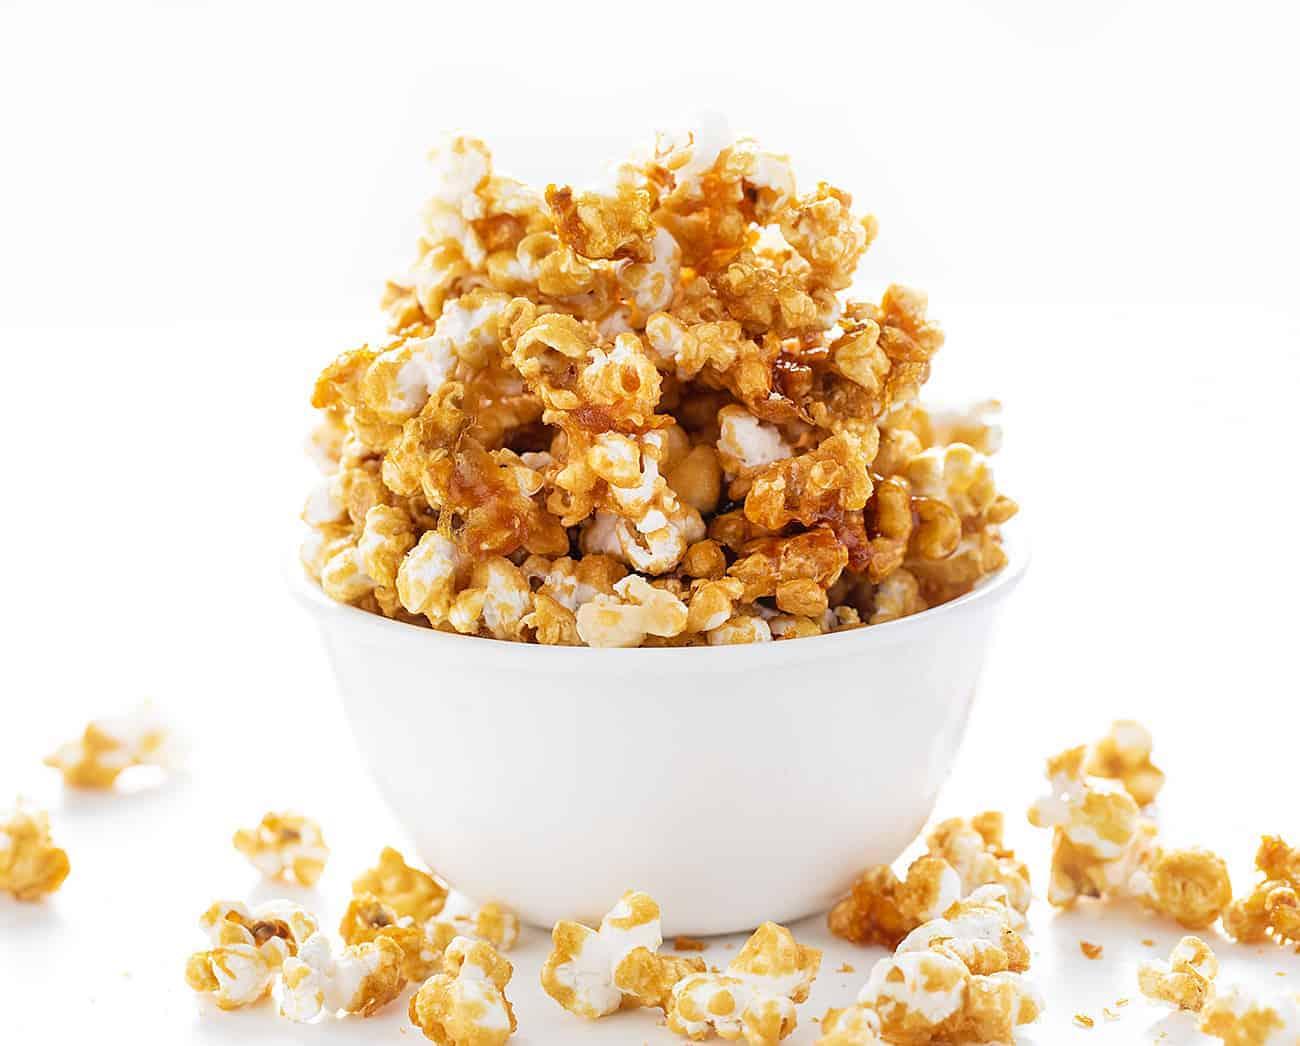 Bowl of Homemade Caramel Corn